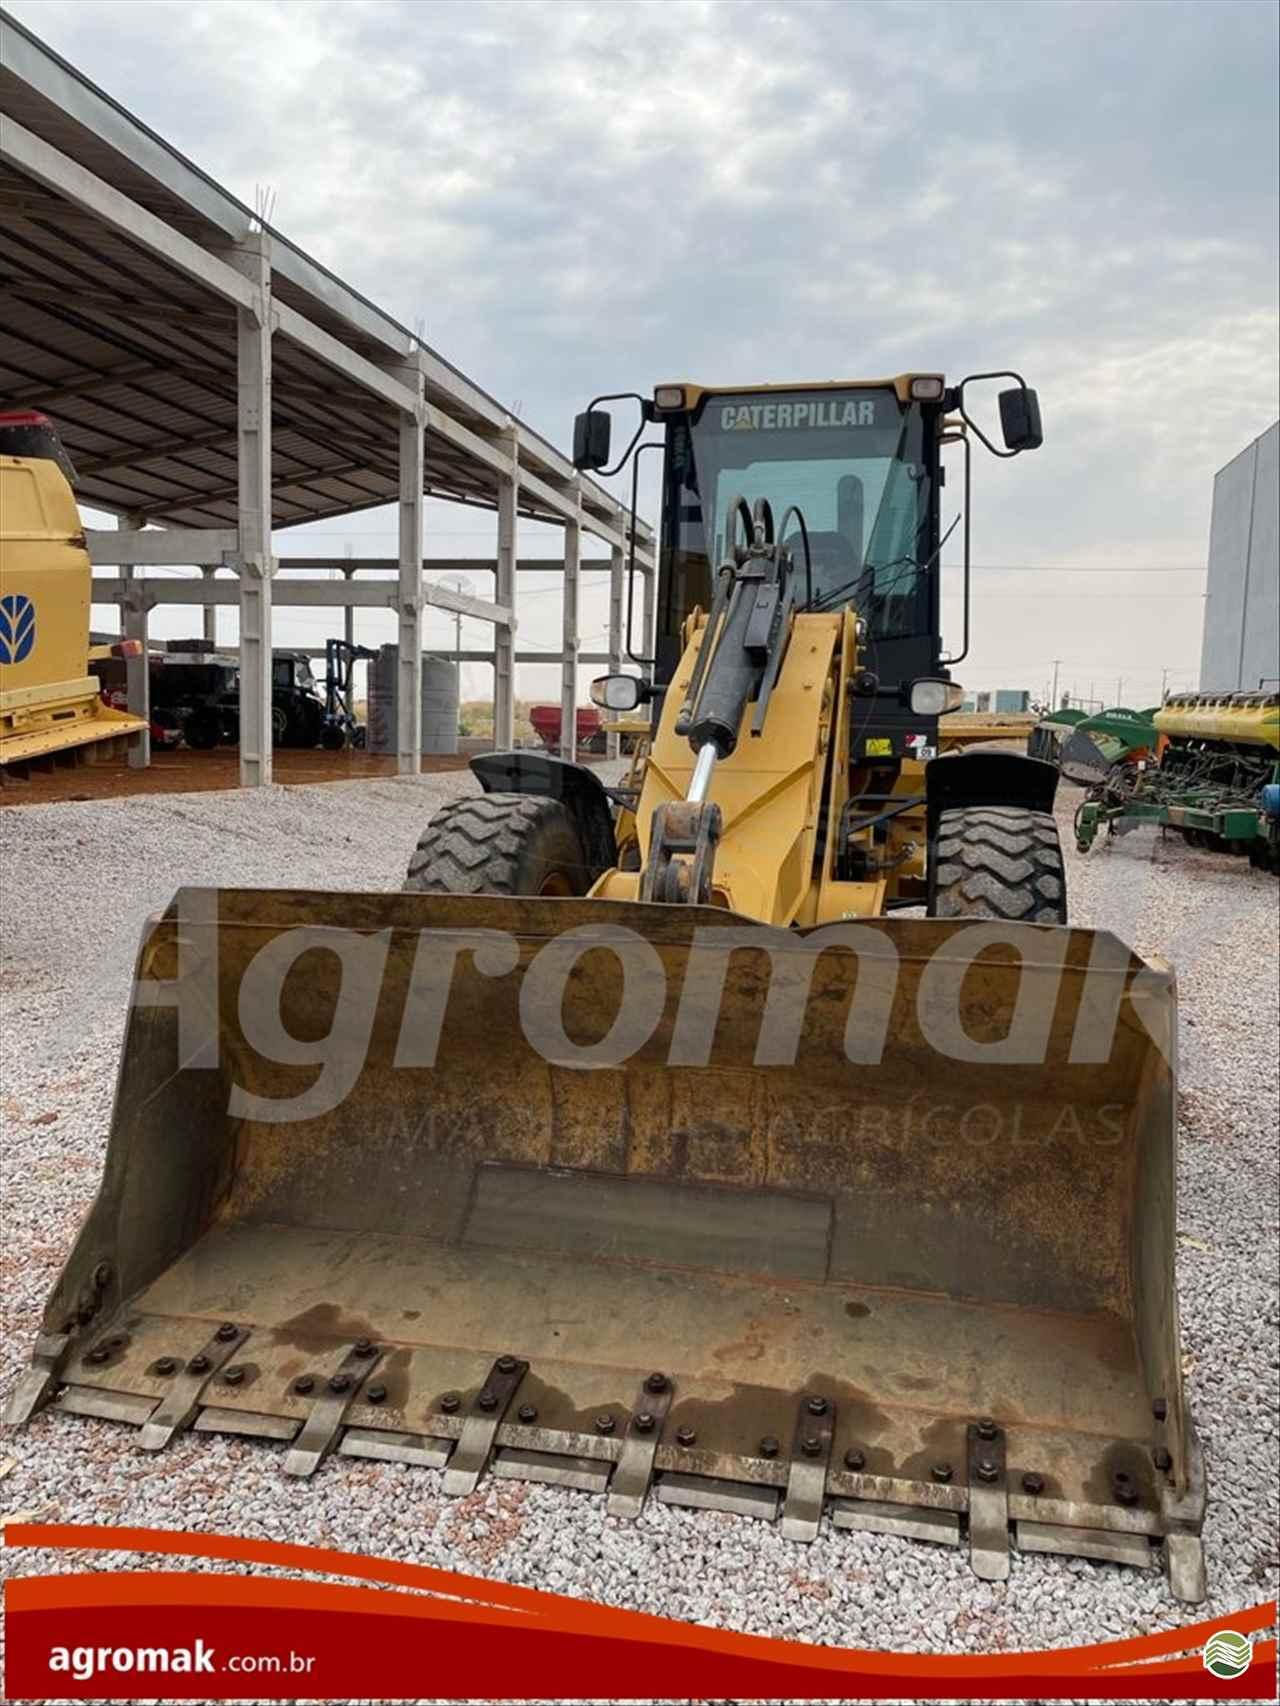 PA CARREGADEIRA CATERPILLAR 924 Agromak Máquinas Agrícolas CAMPO VERDE MATO GROSSO MT